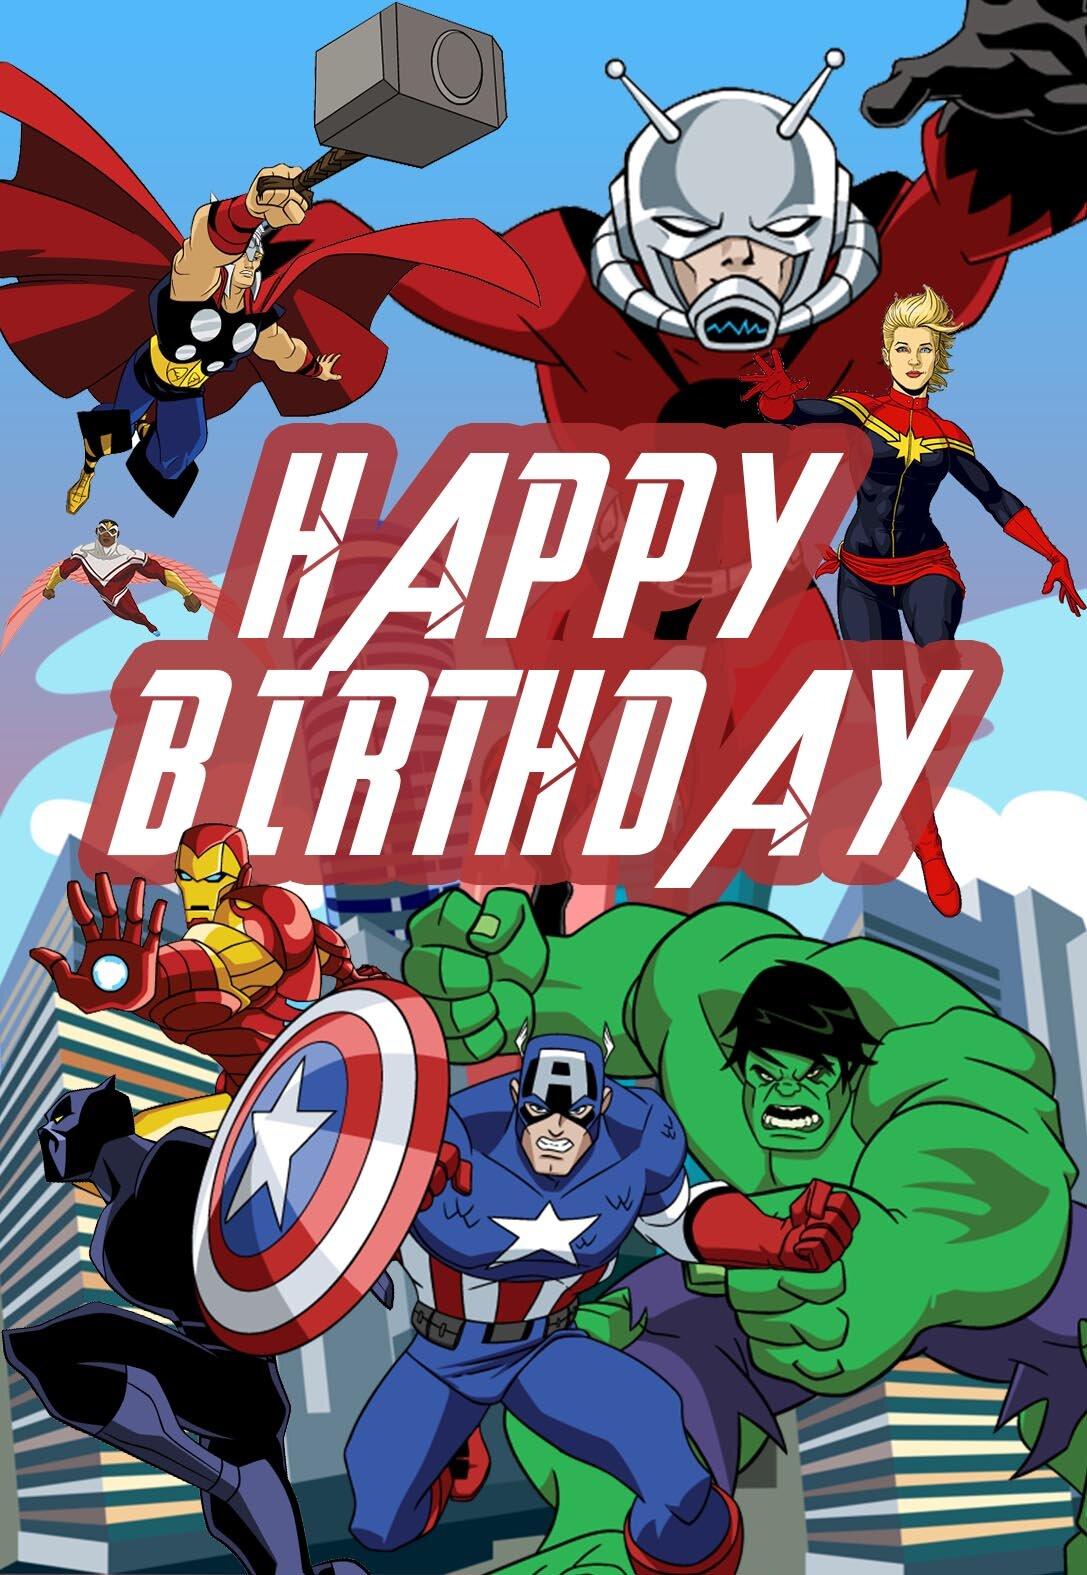 Avengers Printable Birthday Cards — PRINTBIRTHDAY.CARDS